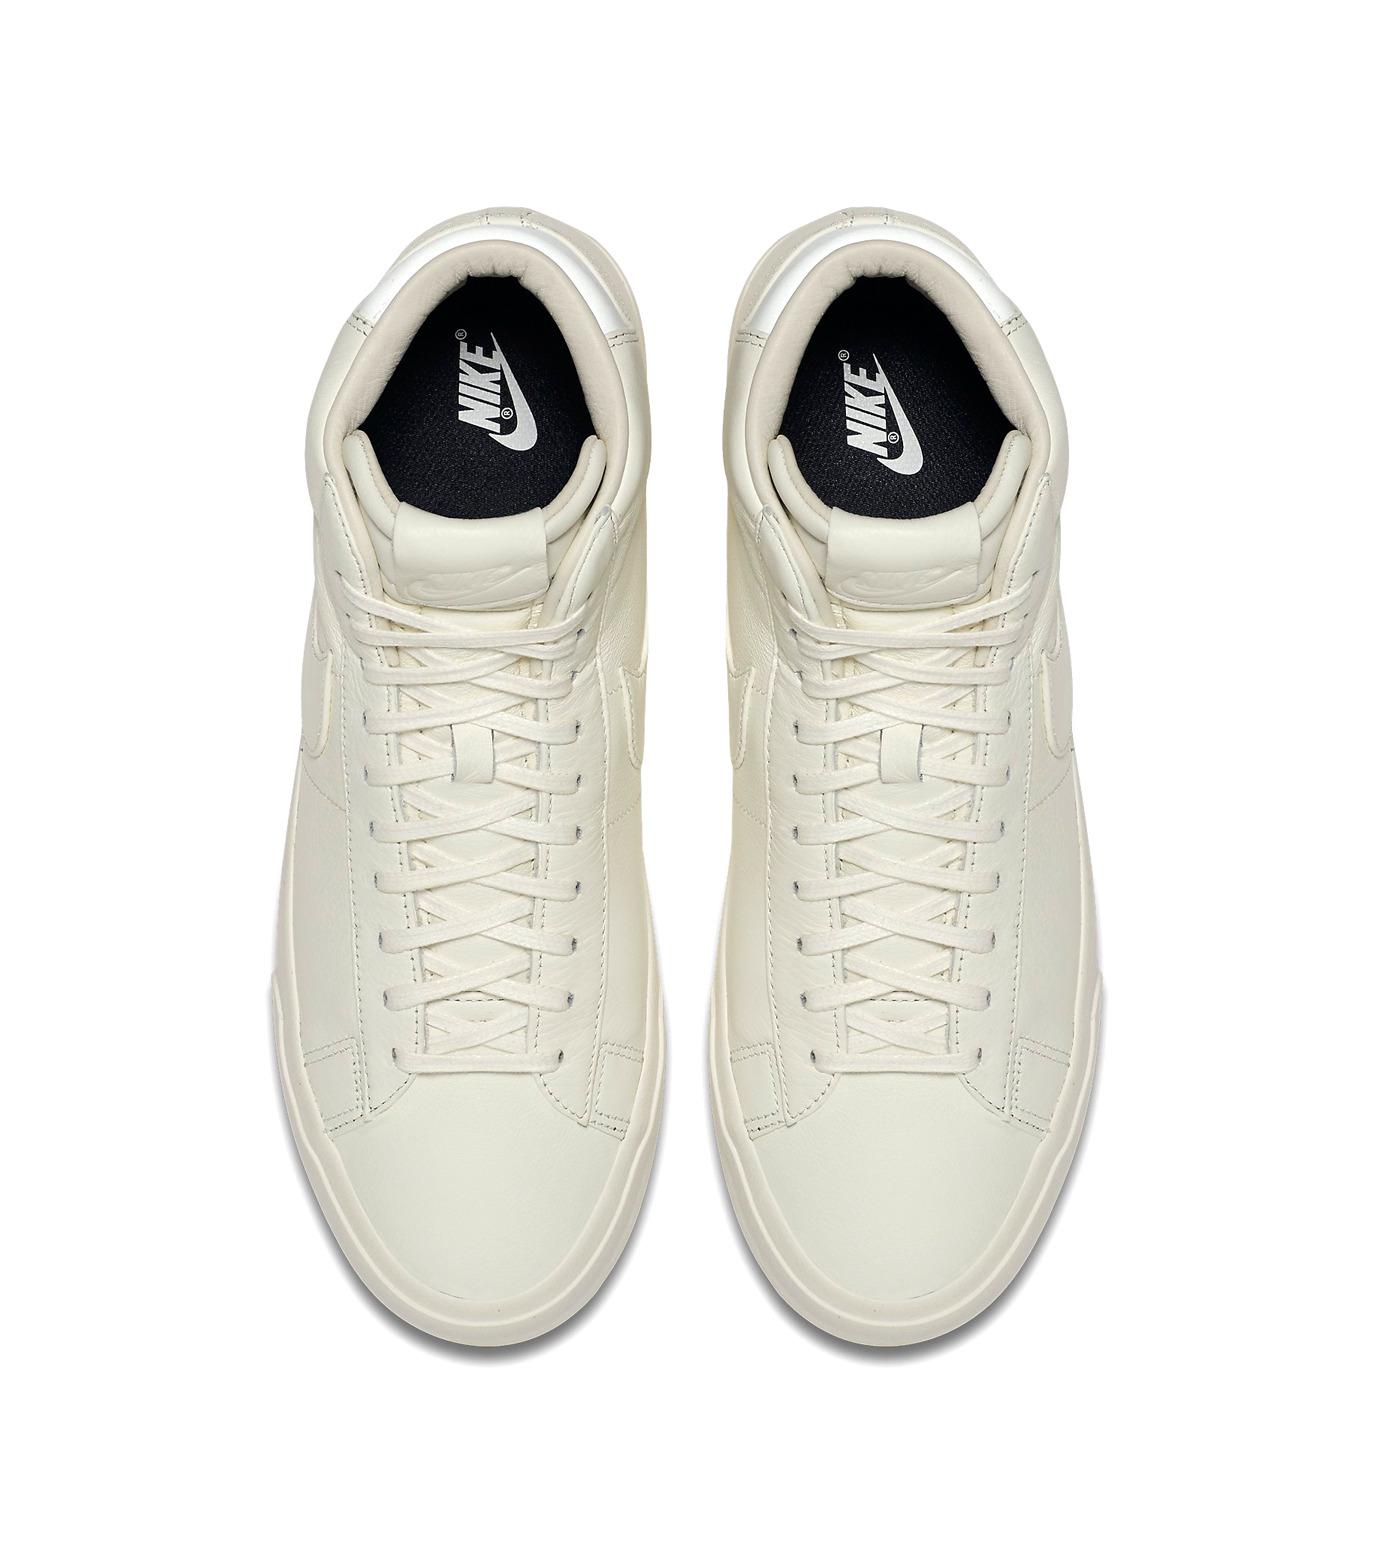 NIKE(ナイキ)のBLAZER STUDIO MID-WHITE(シューズ/shoes)-904805-100-4 拡大詳細画像5